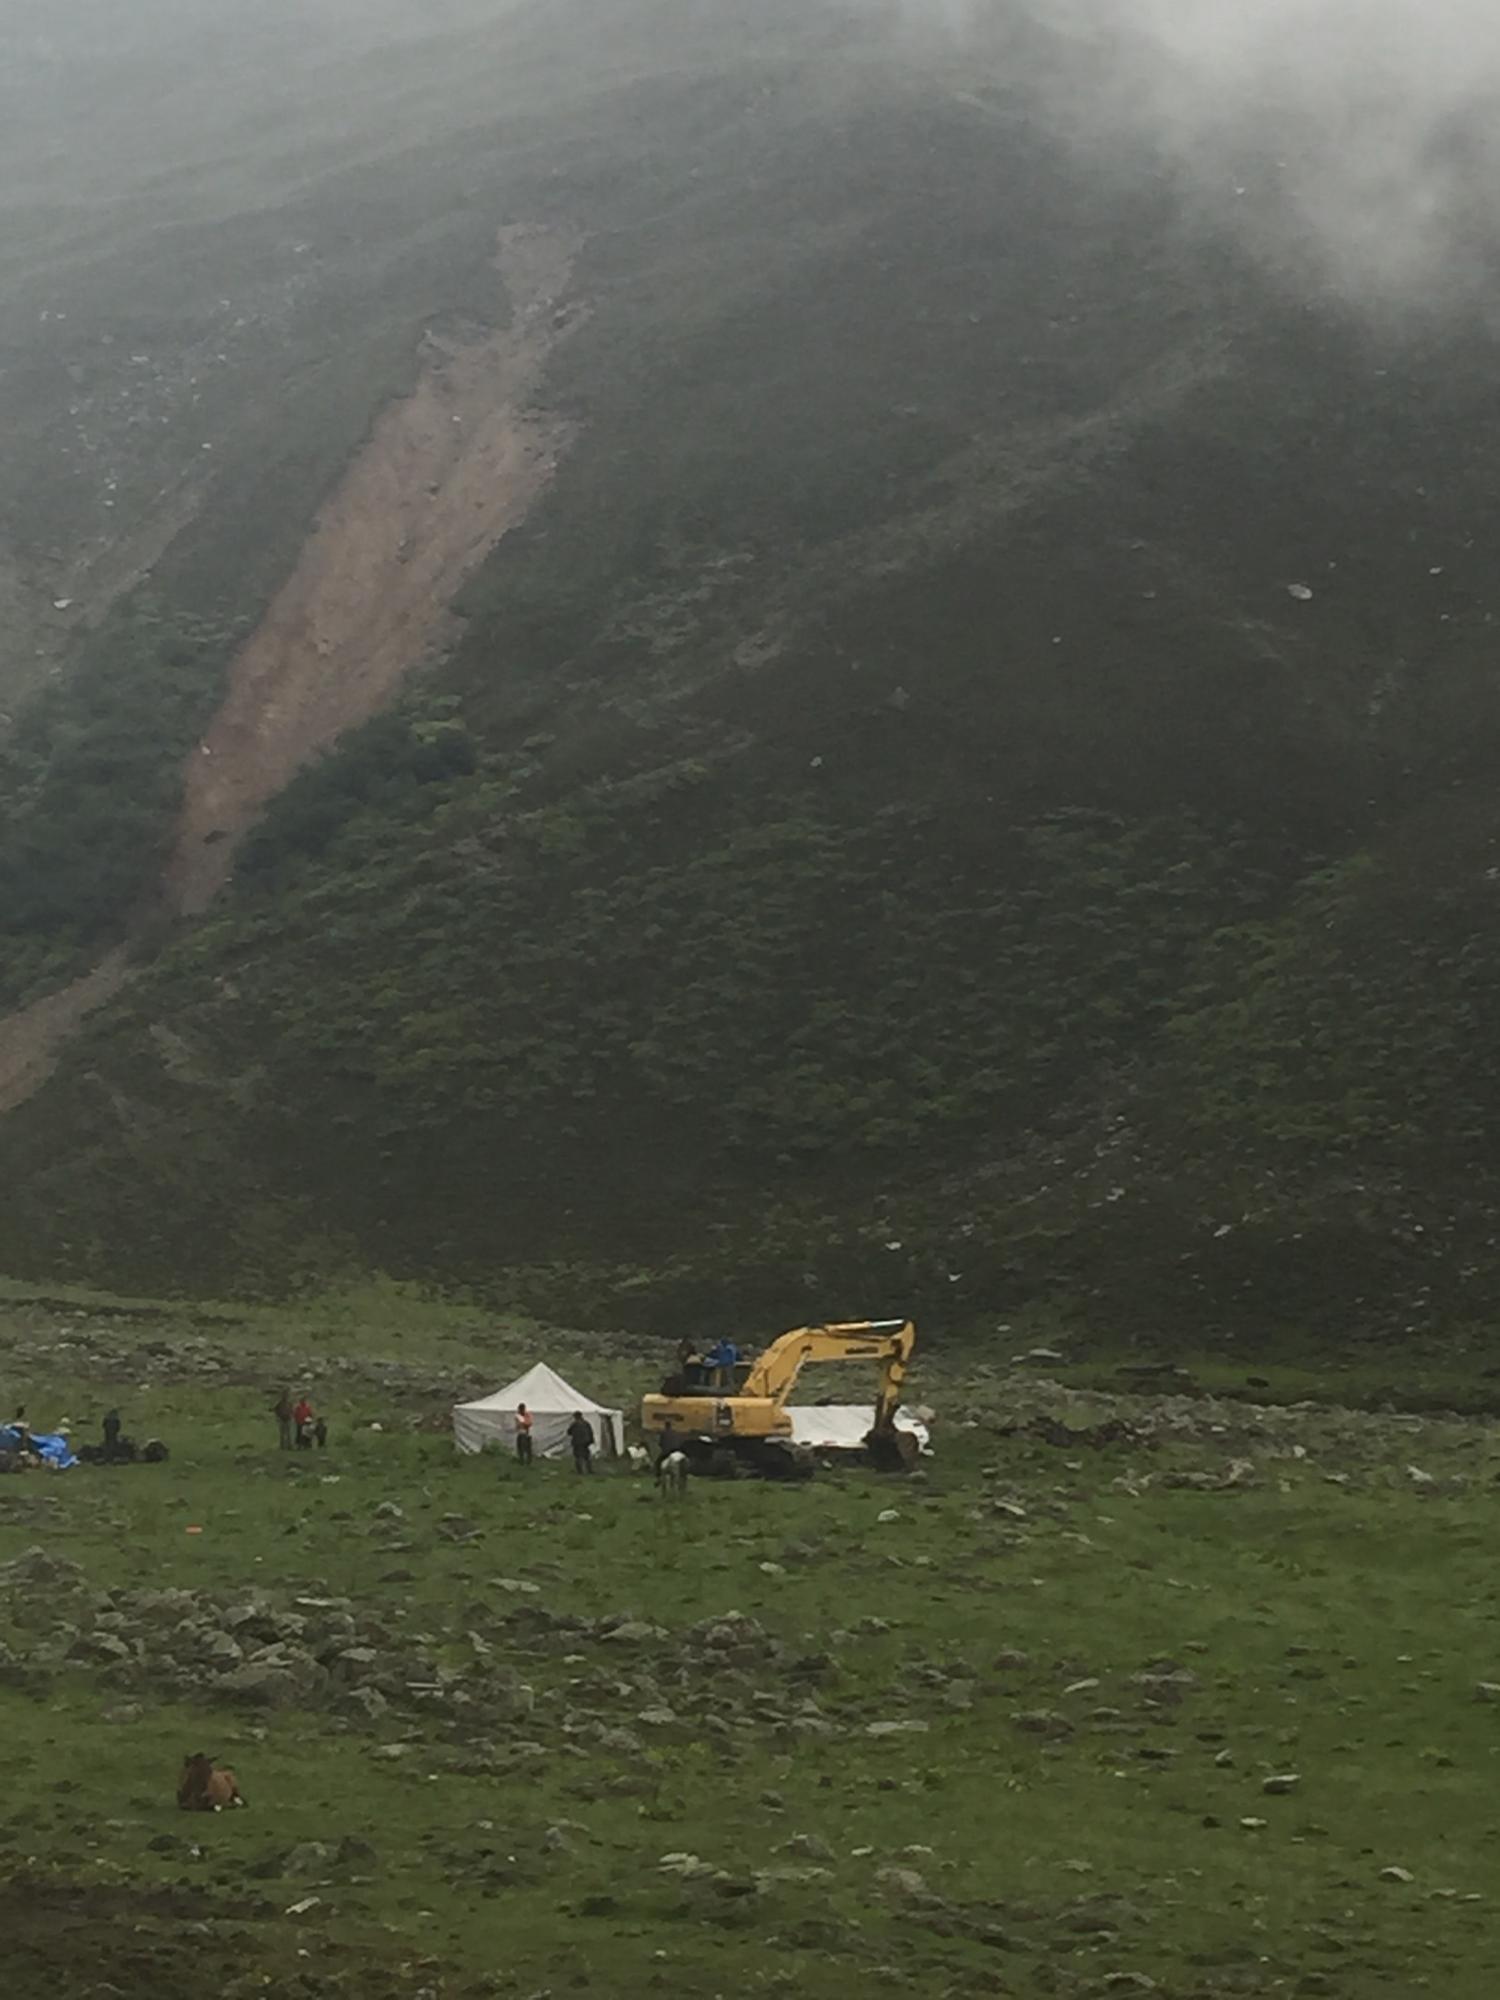 Excavator near the campsite